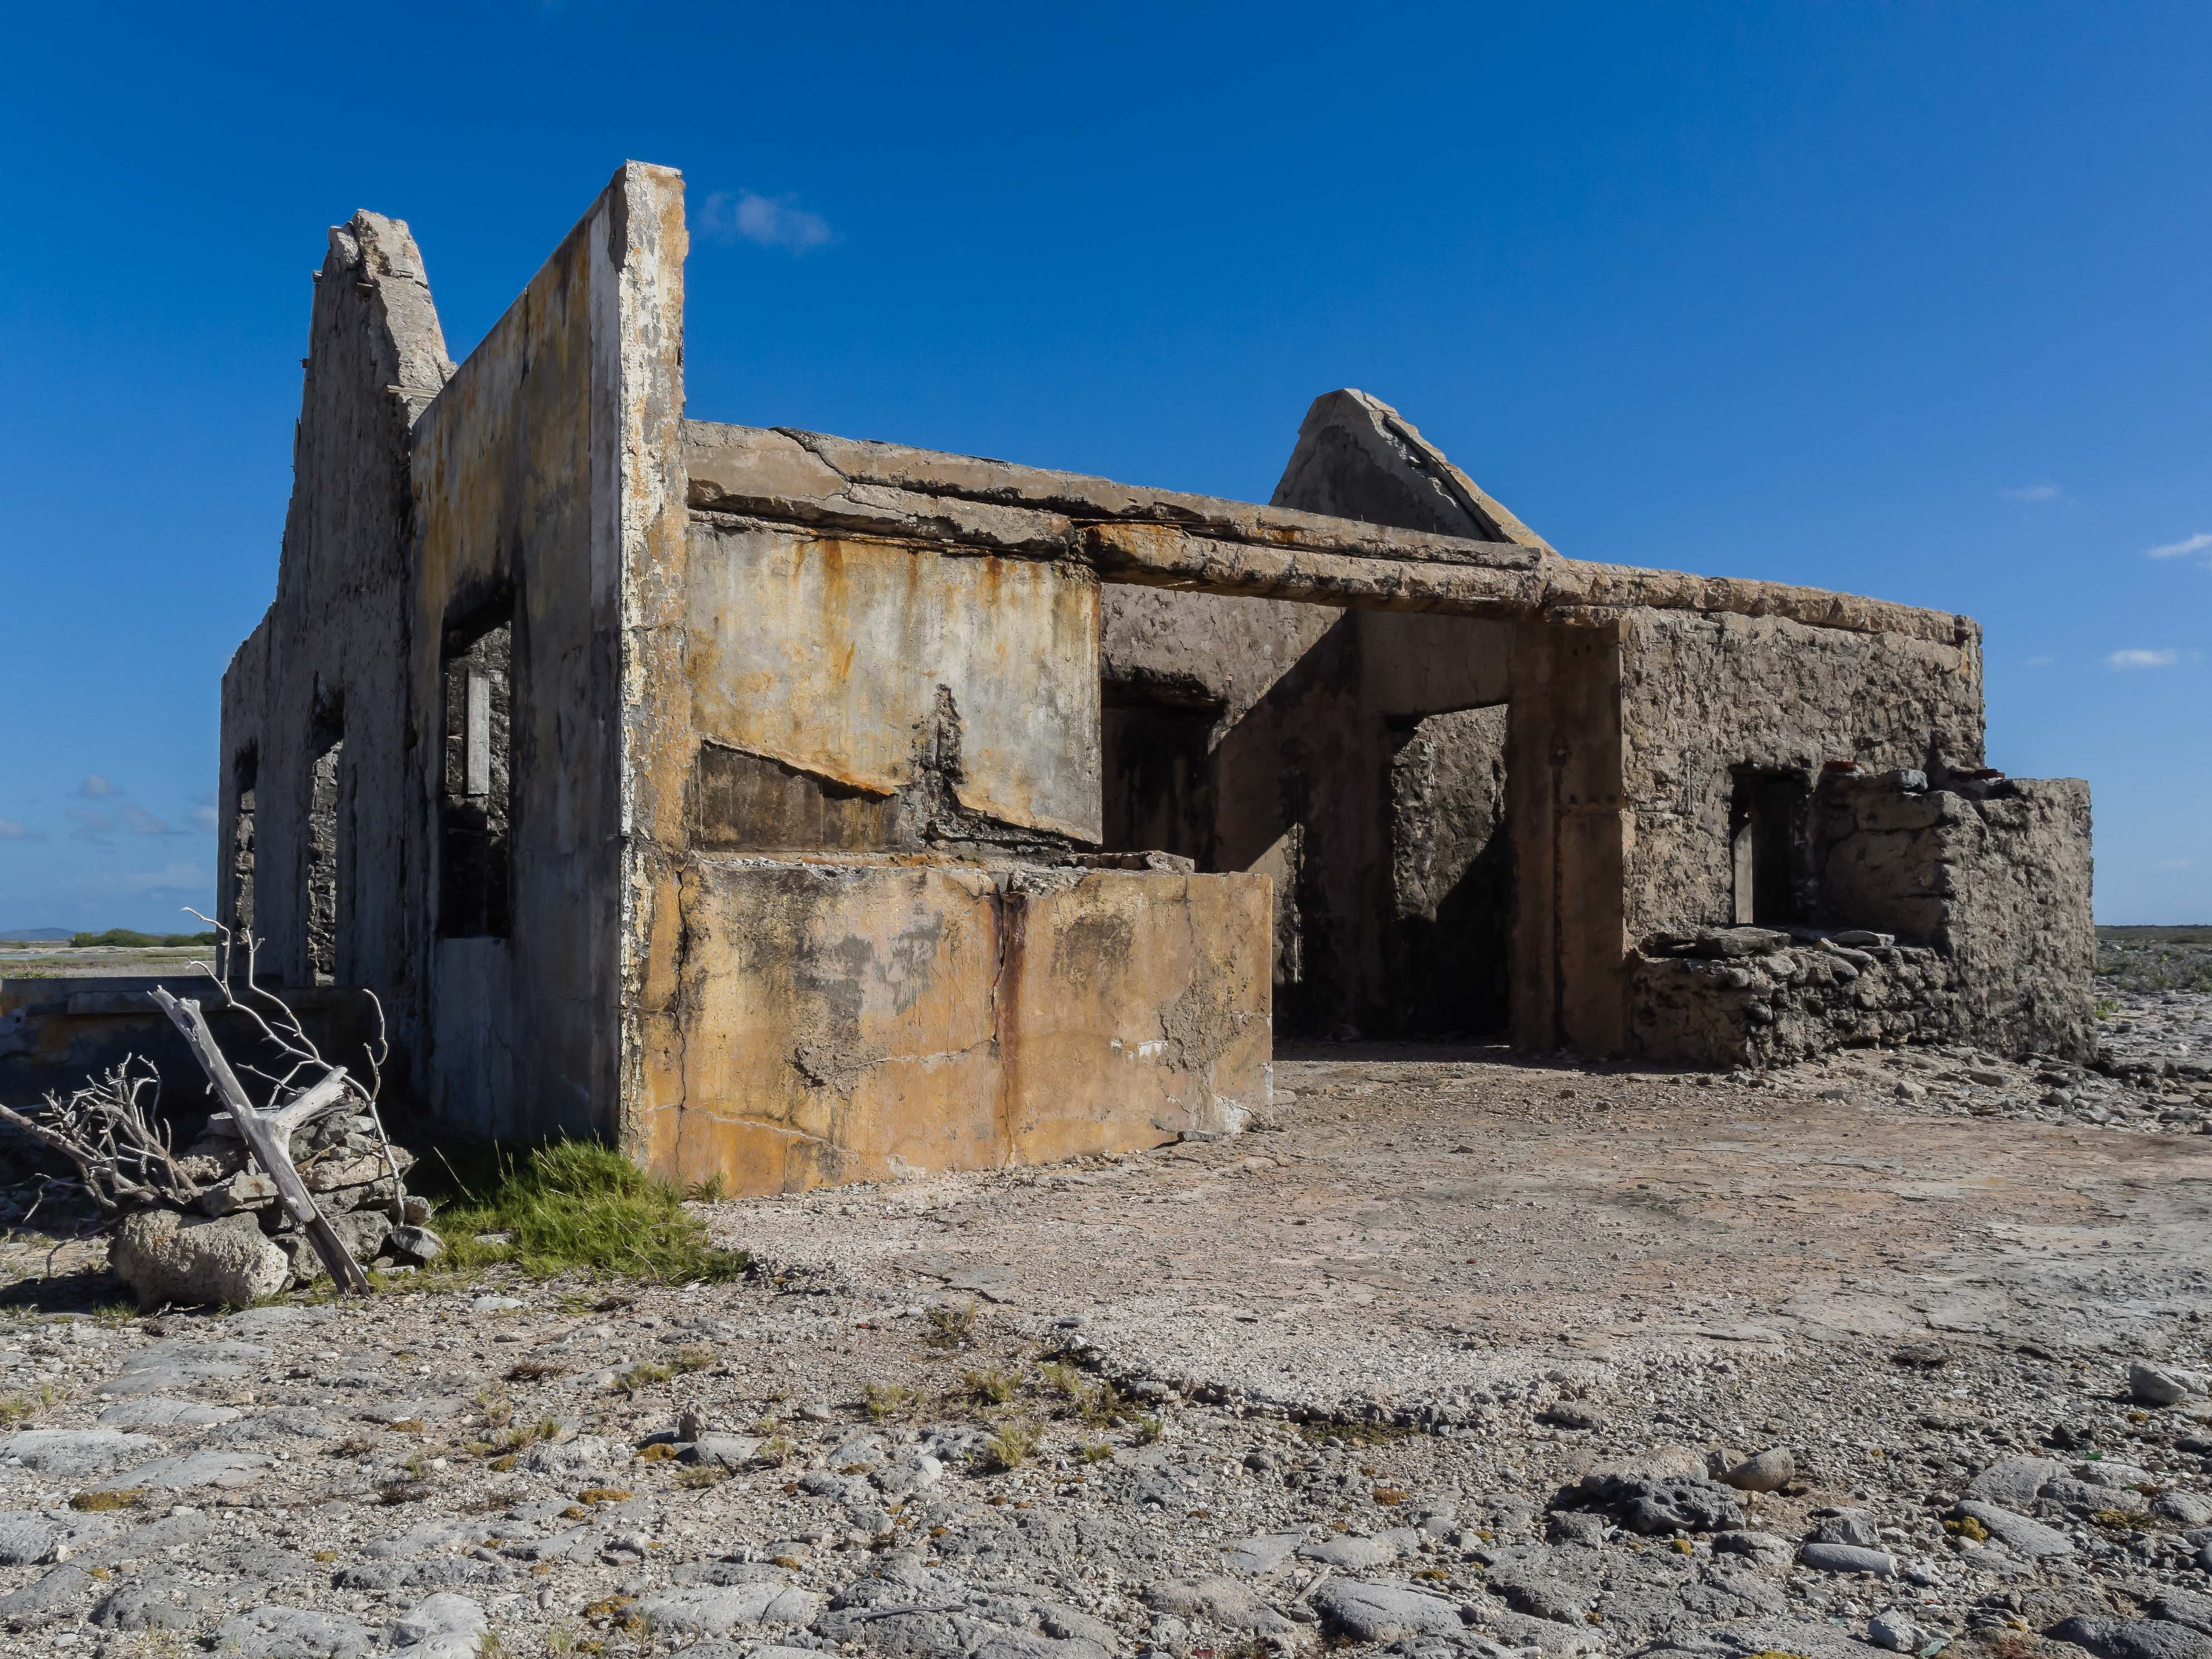 Ruins, Bonaire, Building, House, Old, HQ Photo